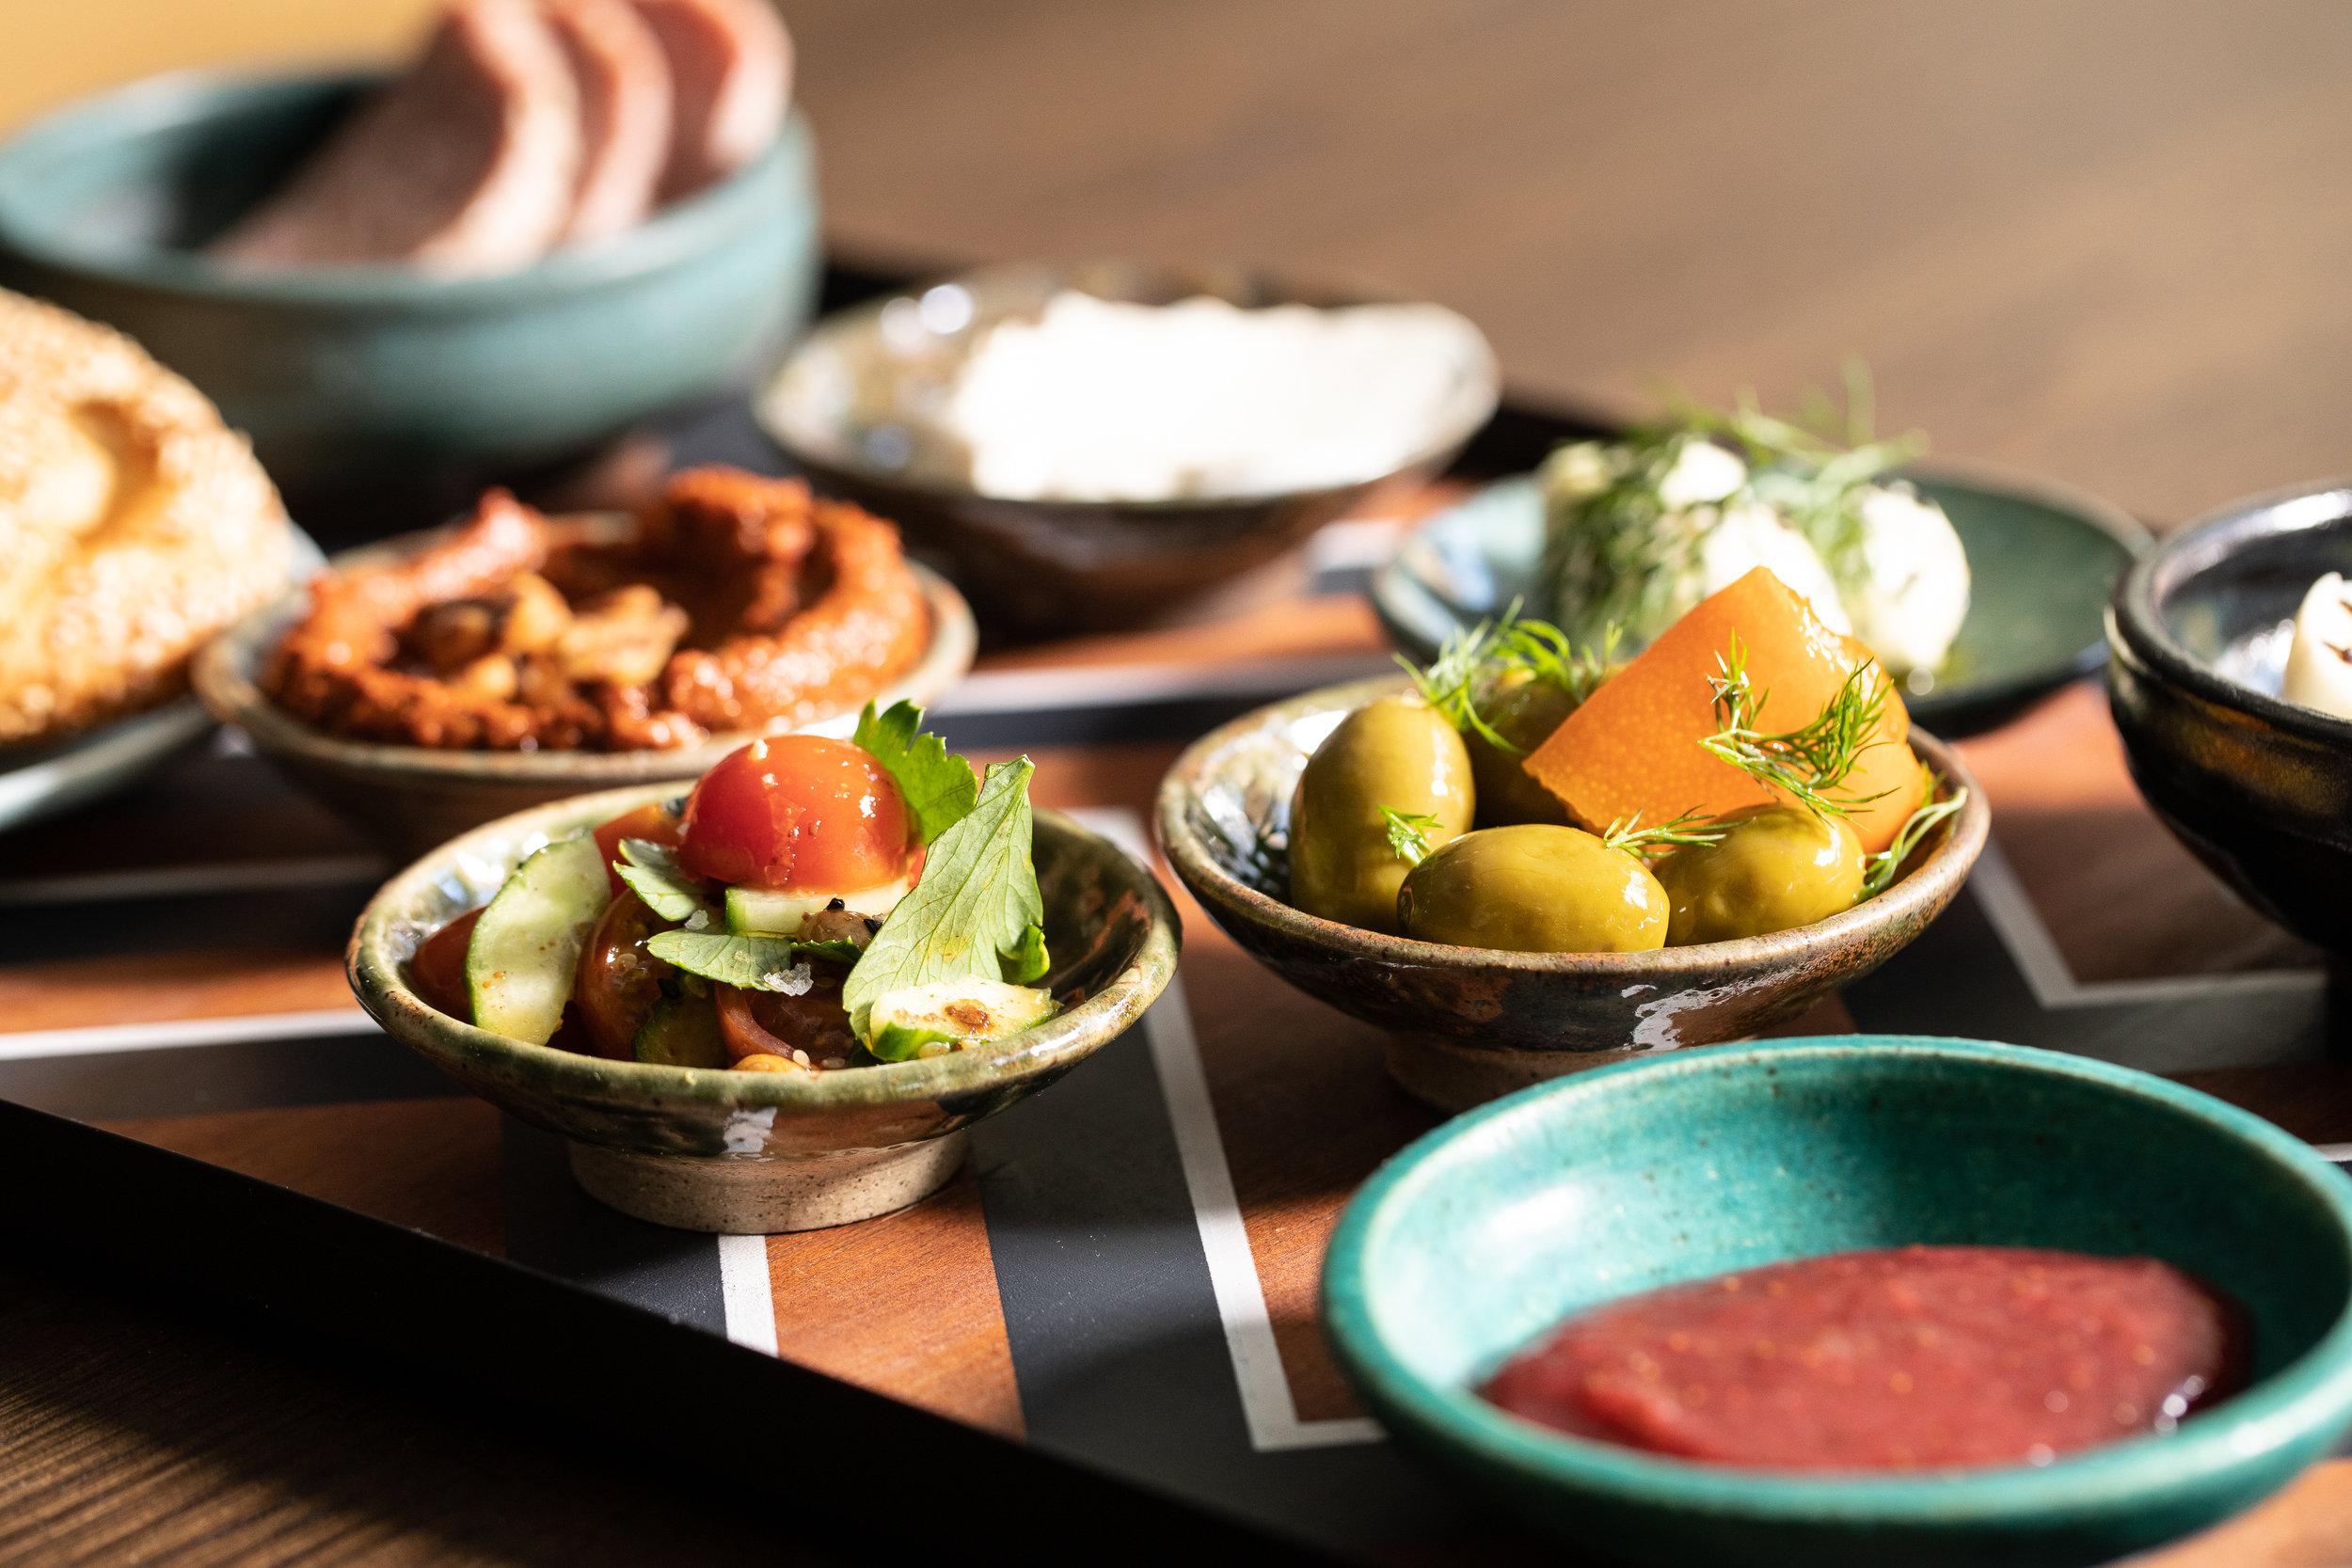 Cira food-mezze spread-olives-small plates-GALDOPHOTO Hoxton_26Mar2019_HG0013.jpg